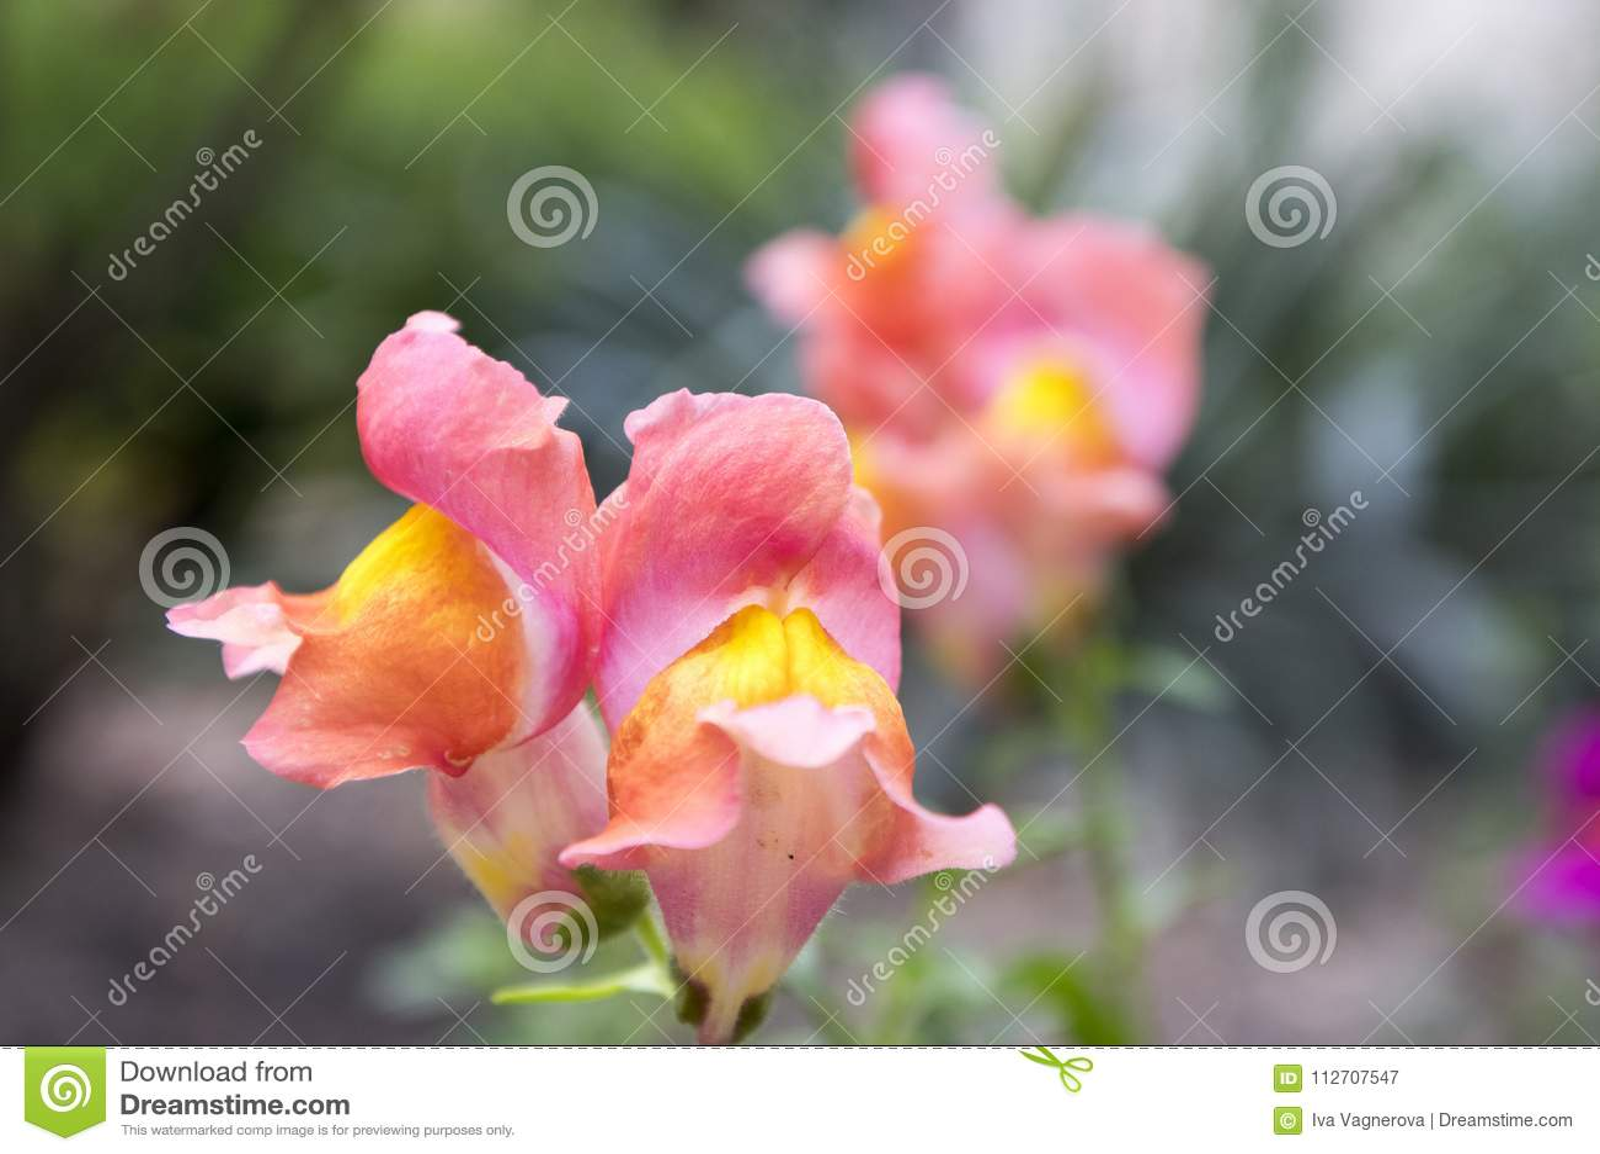 Antirrhinum Majus Common Snapdragon In Bloom Stock Image Image Of